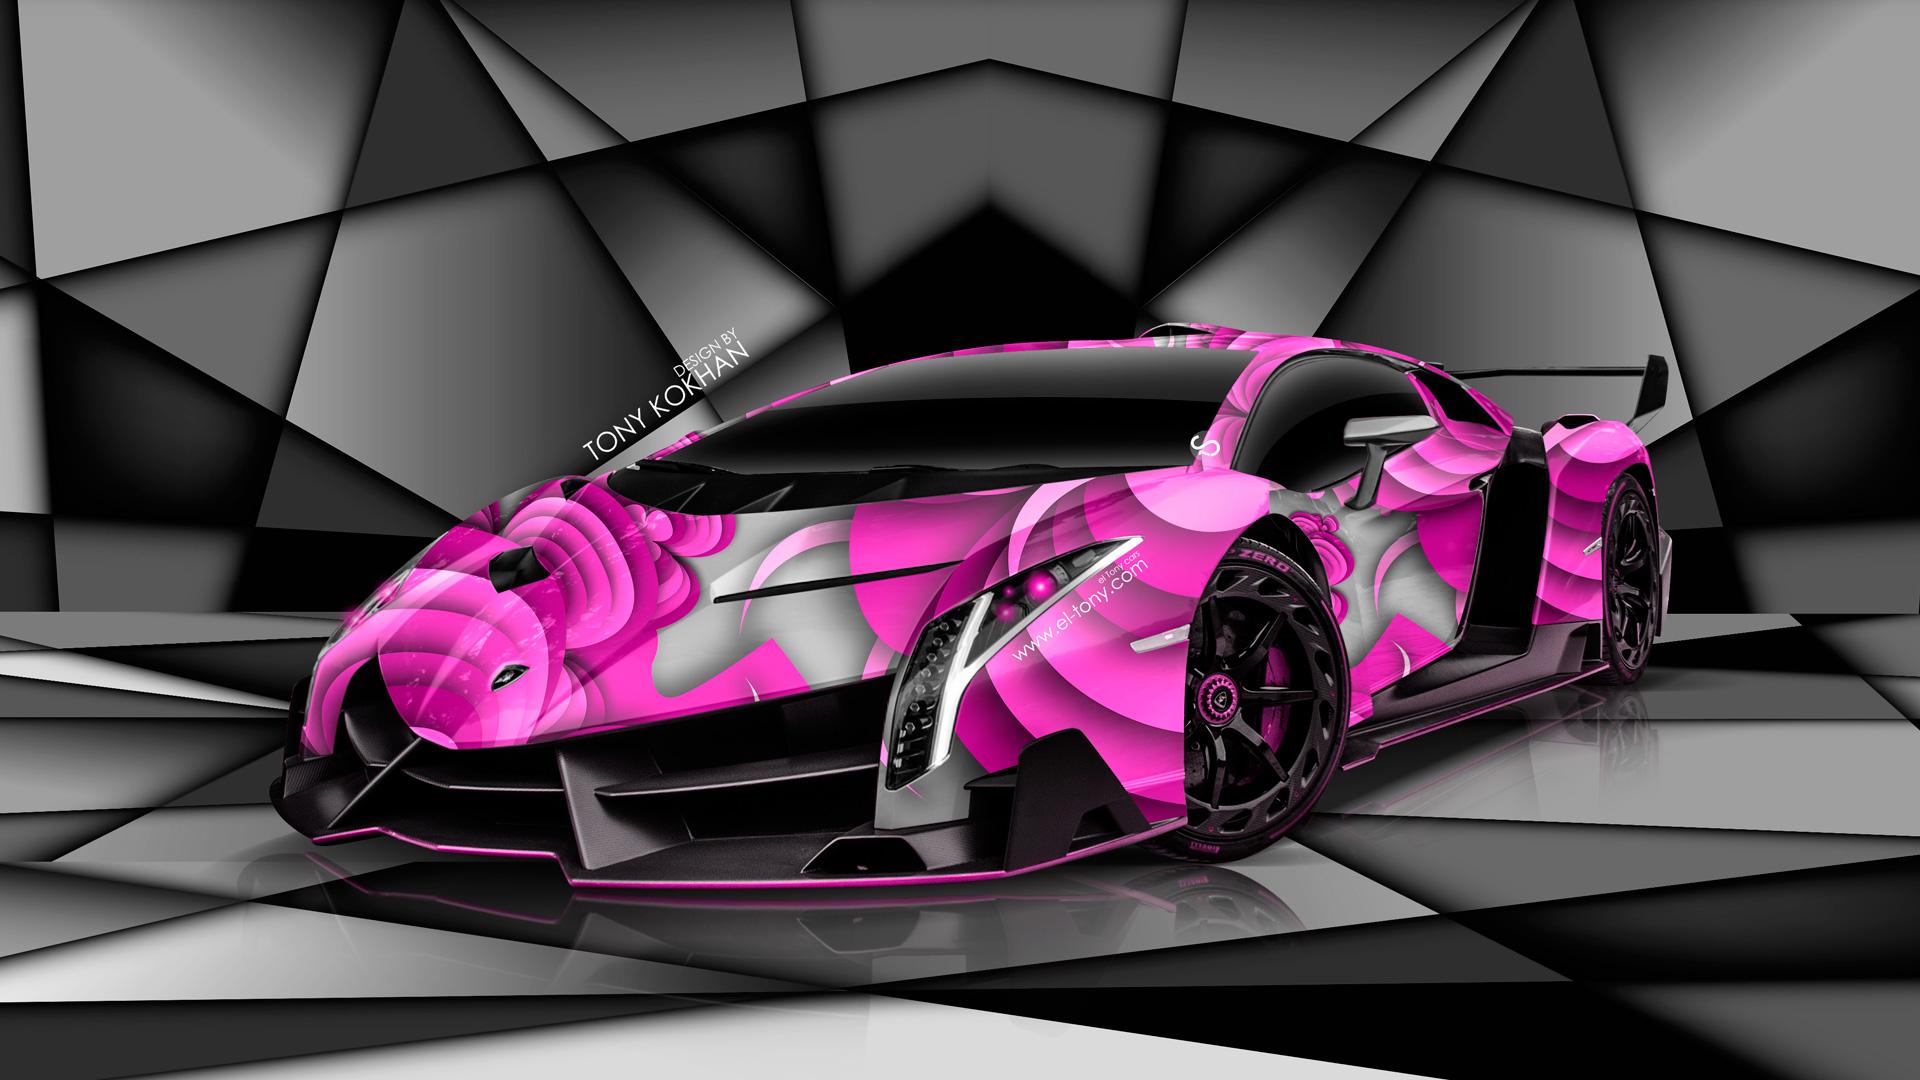 lamborghini veneno super aerography car 2014 pink colors